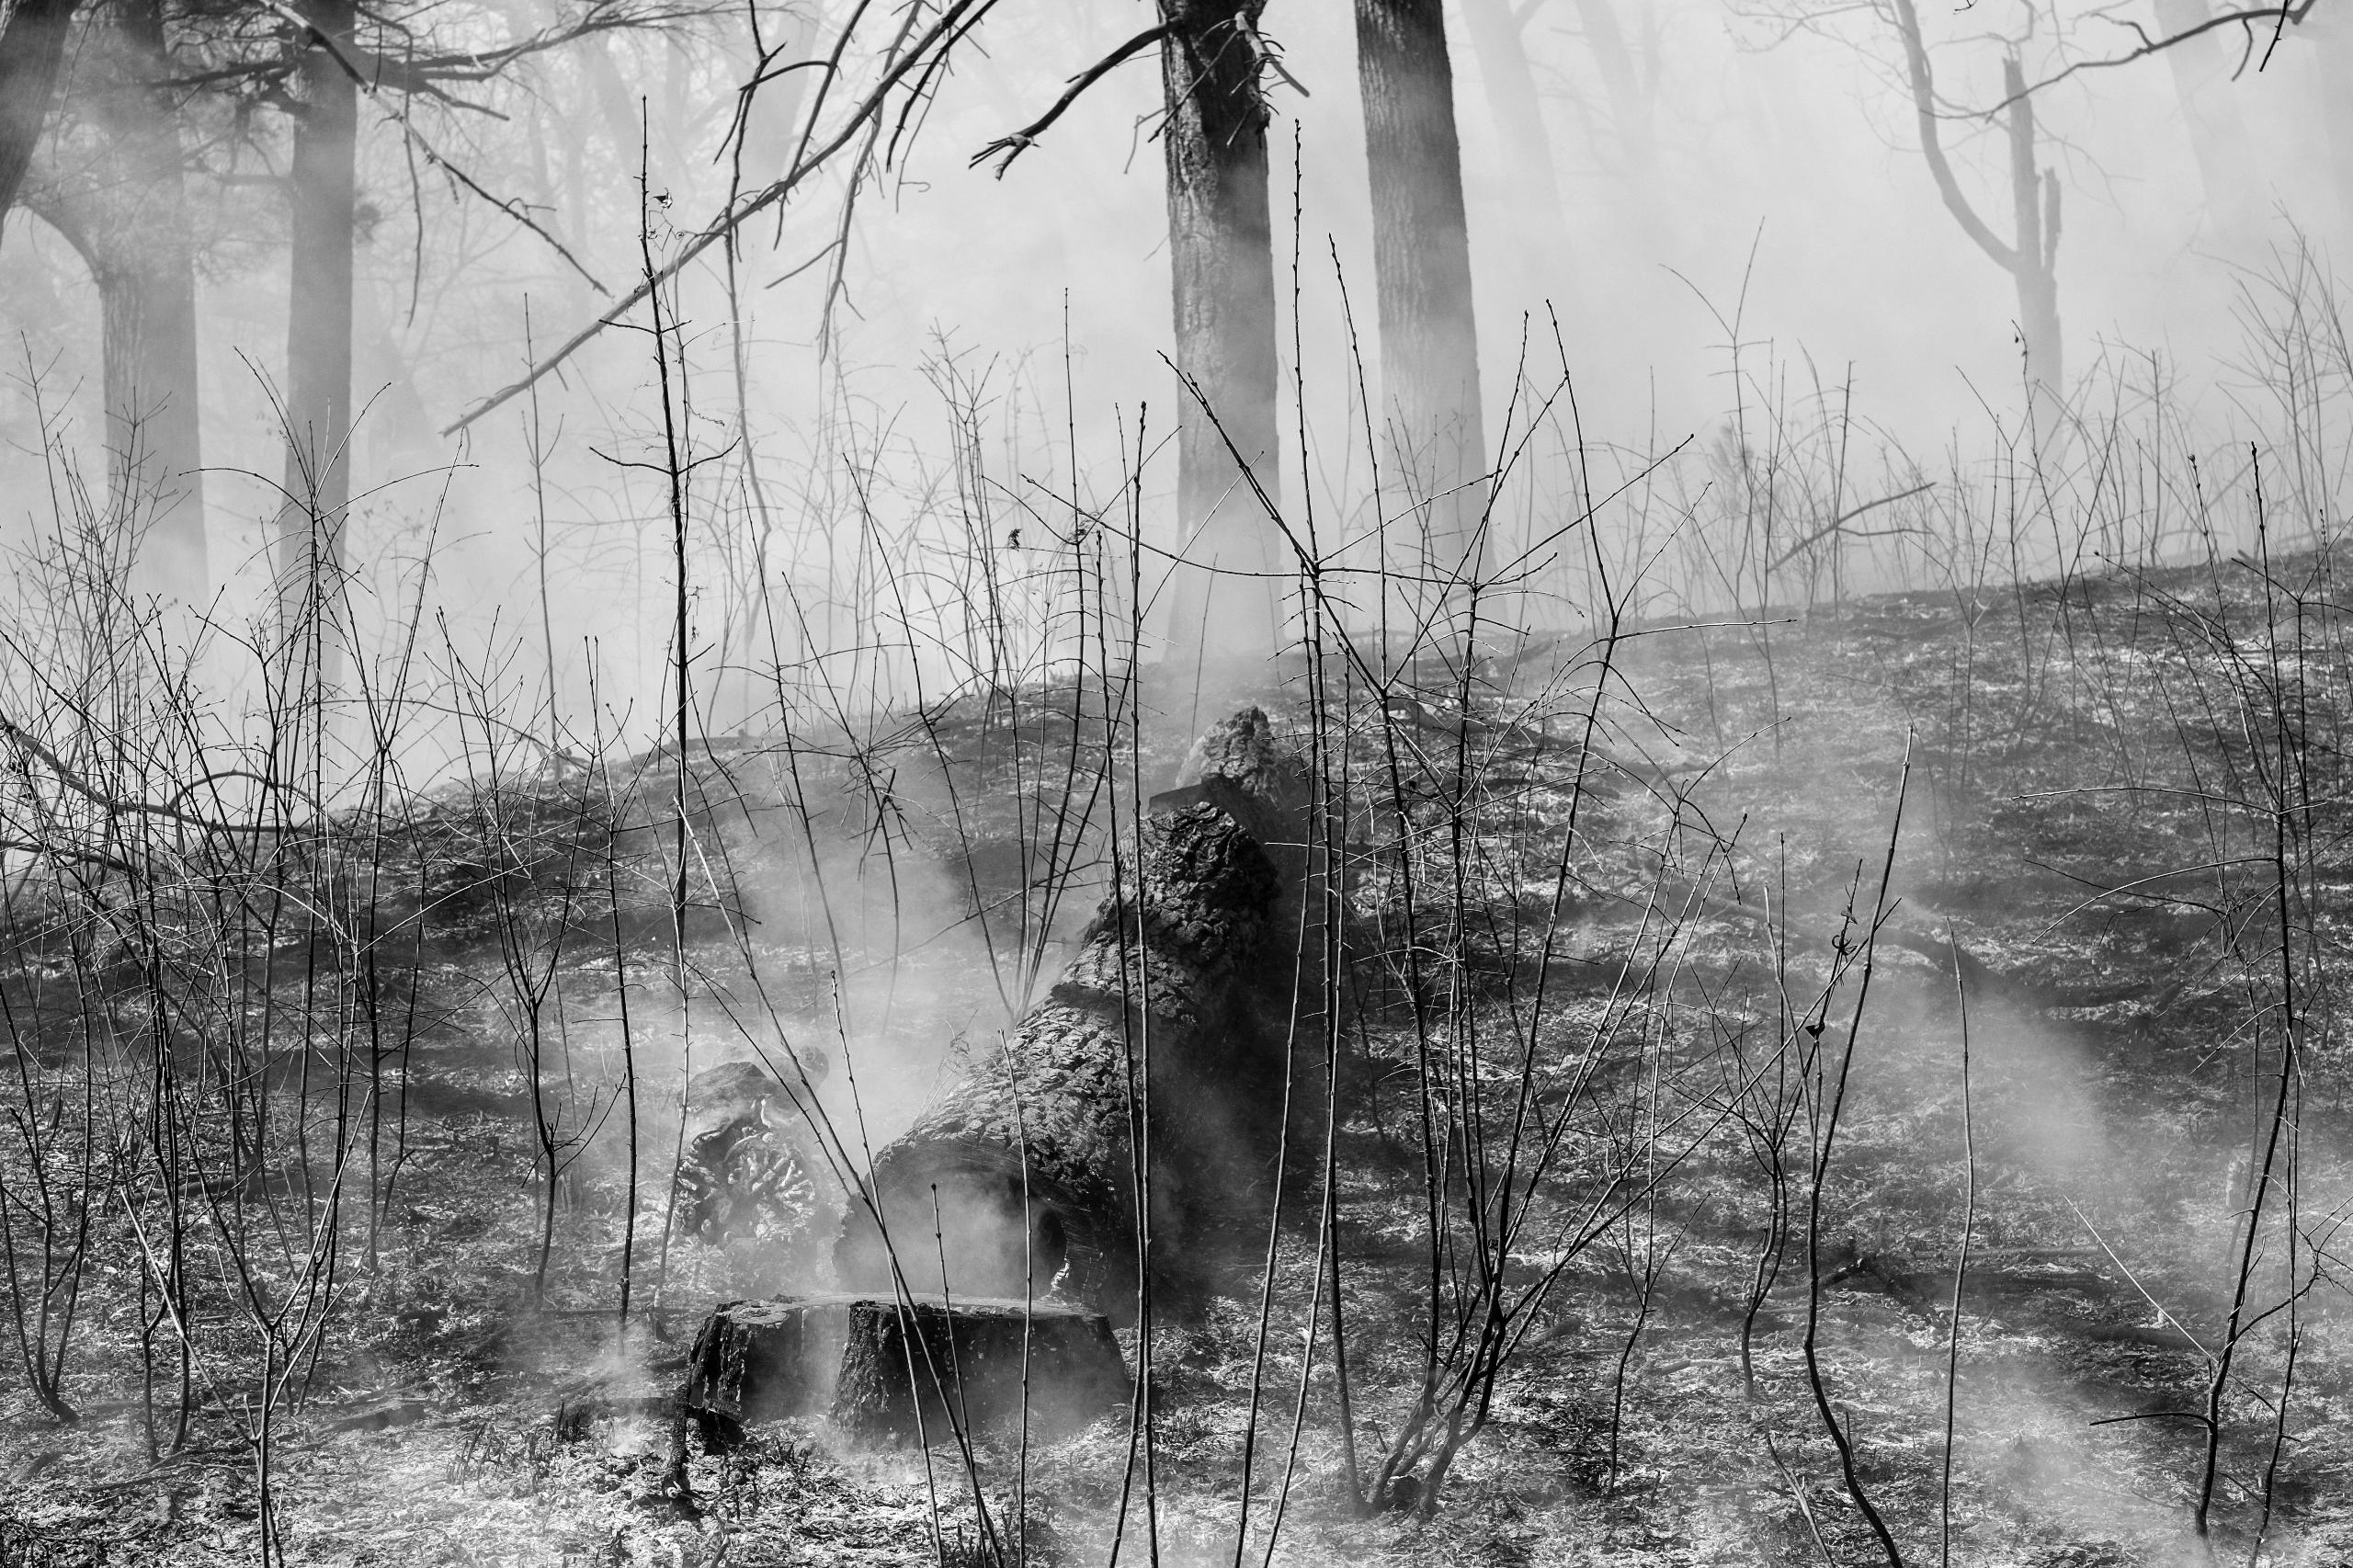 Smoky Remains =========== Fujif - benroffelsen | ello